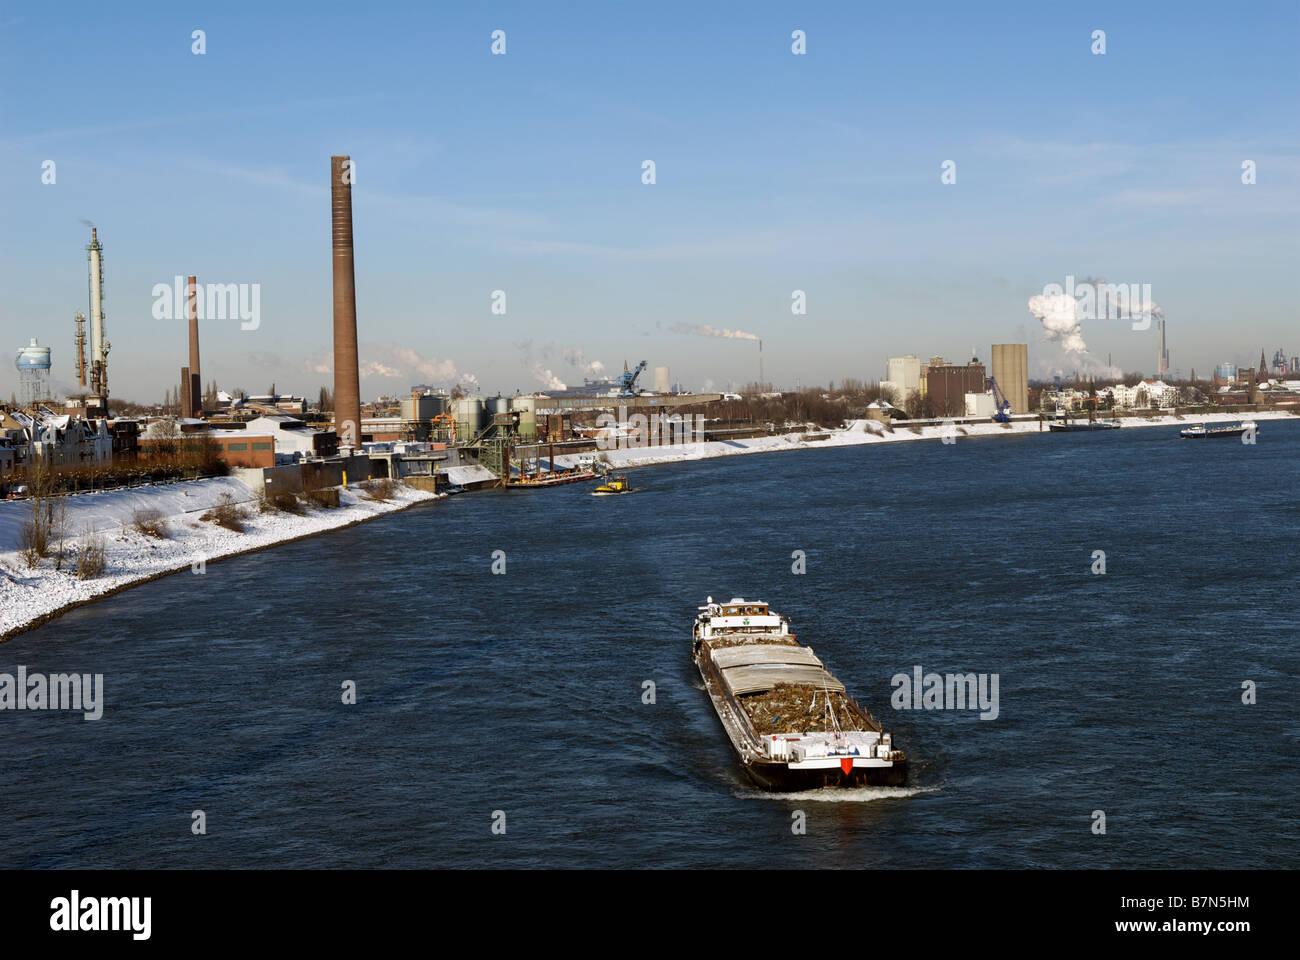 River Rhine, Duisburg/Homberg, North Rhine-Westphalia, Germany. Stock Photo